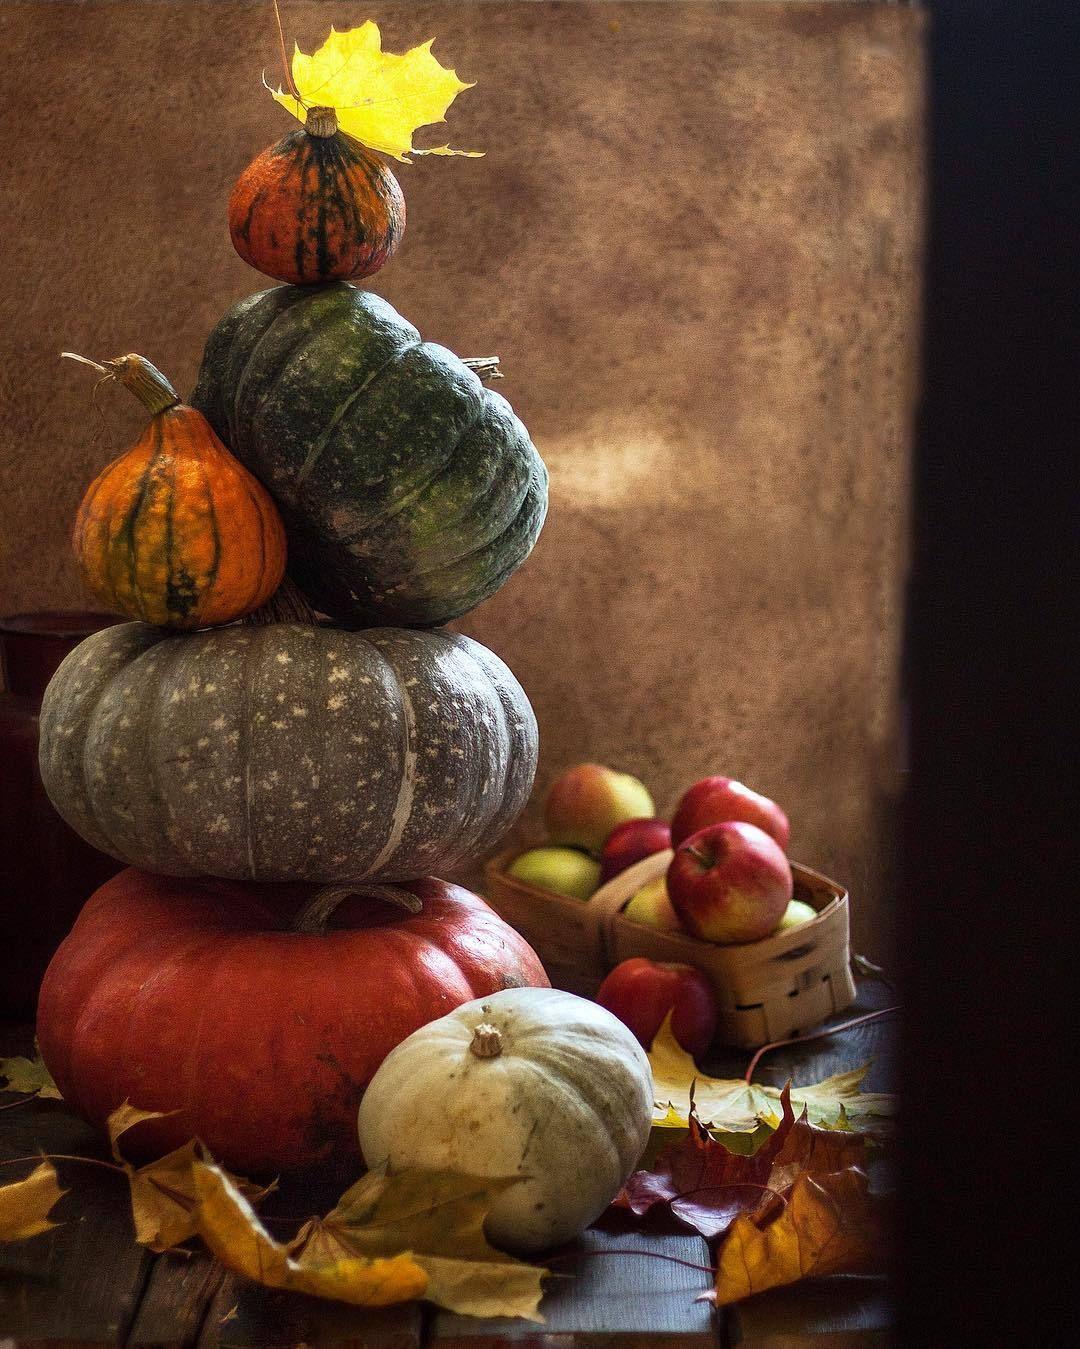 Pin By Manicurelover On Autumn Splendour Garden Whimsy Fabulous Fall Pumpkin Orange